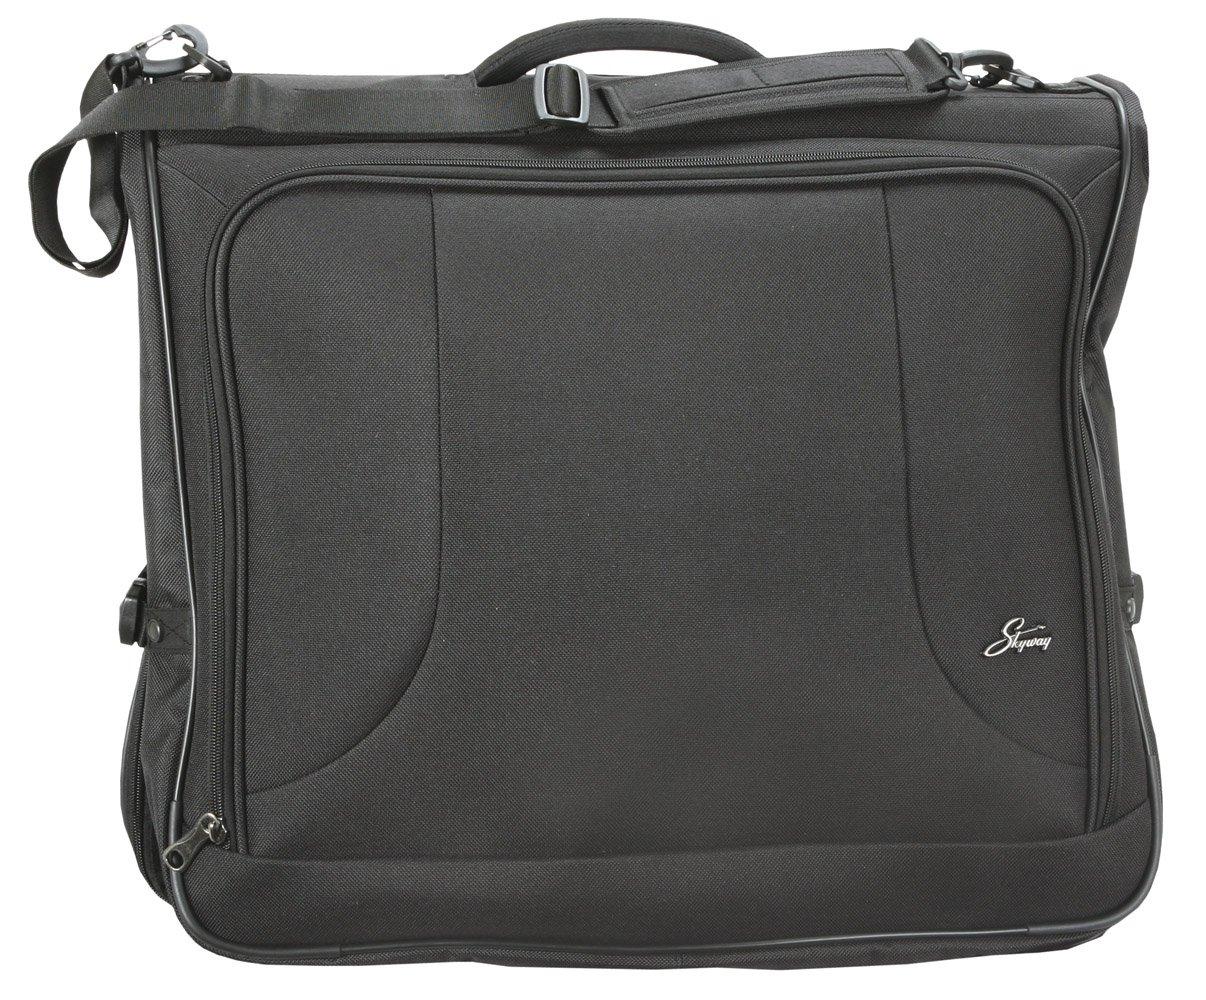 Shop Skyway Sigma 5.0 42-inch Rolling Garment Bag - Free ...  Skyway Wheeled Garment Bags